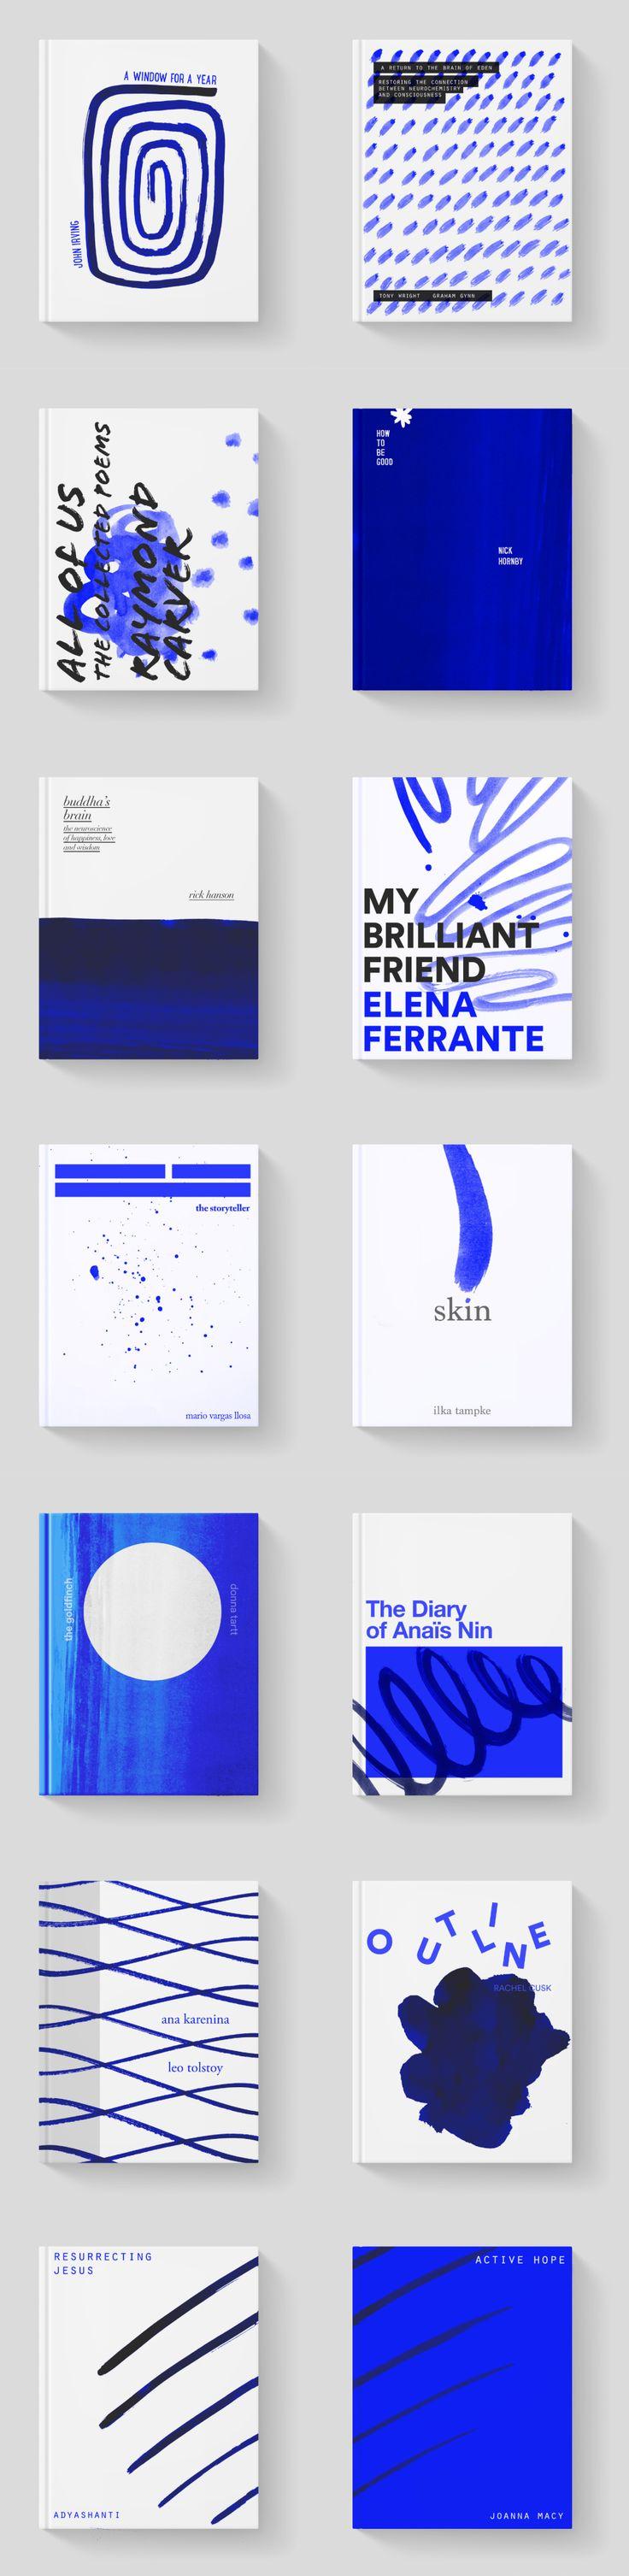 Books_in_Greece_2015 by Regine Abos